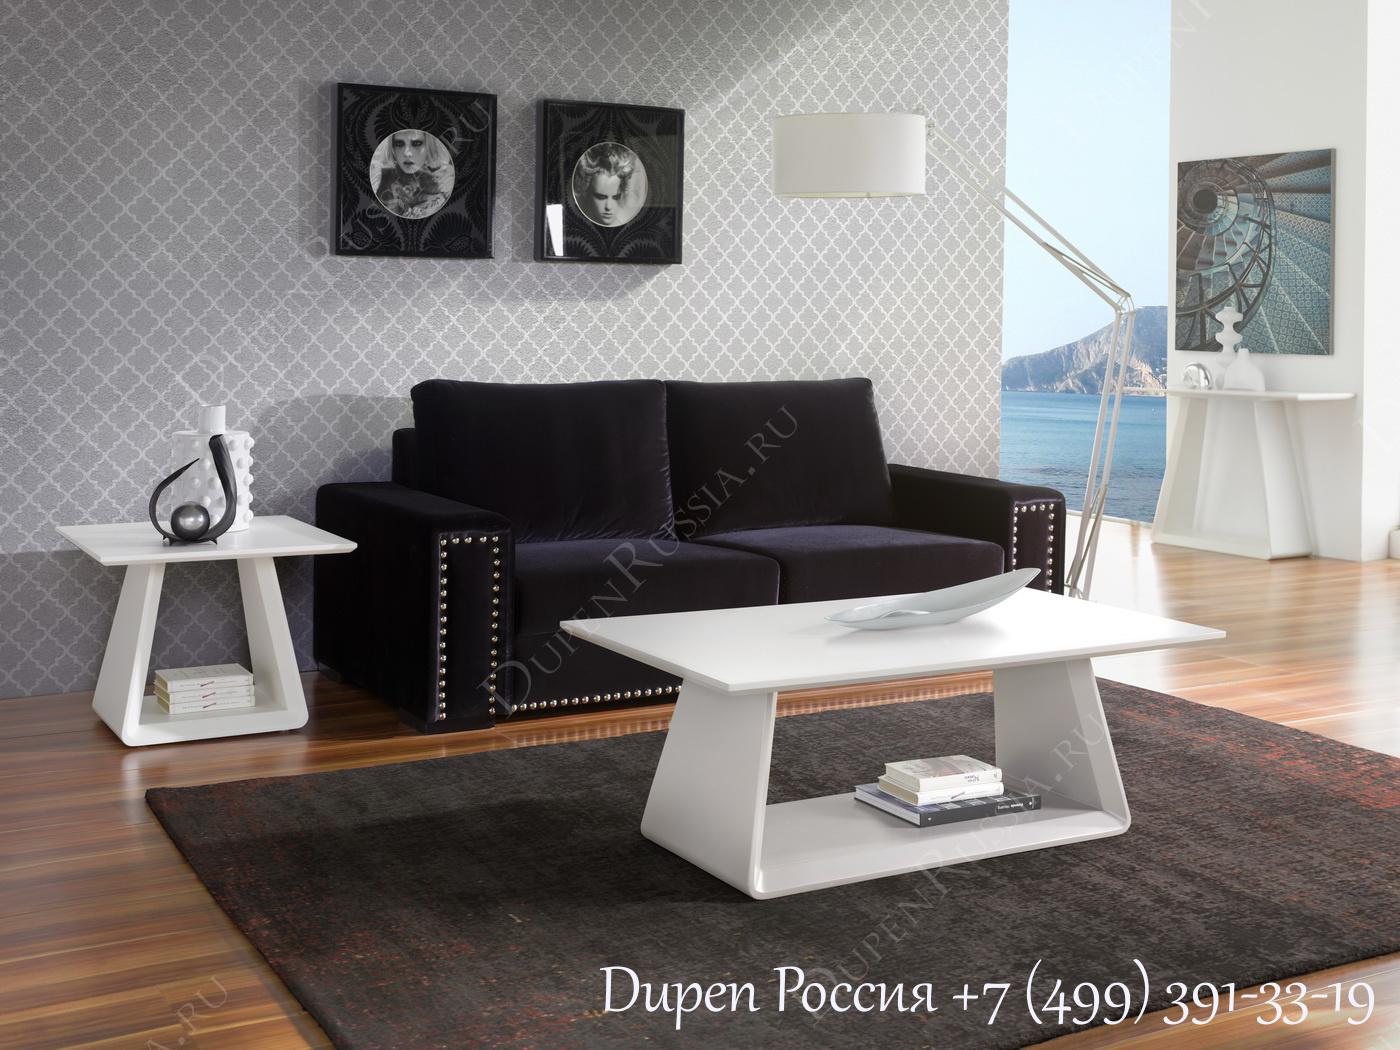 Журнальный стол DUPEN CT-222 Белый матовый, Журнальный стол DUPEN CT-223 Белый матовый